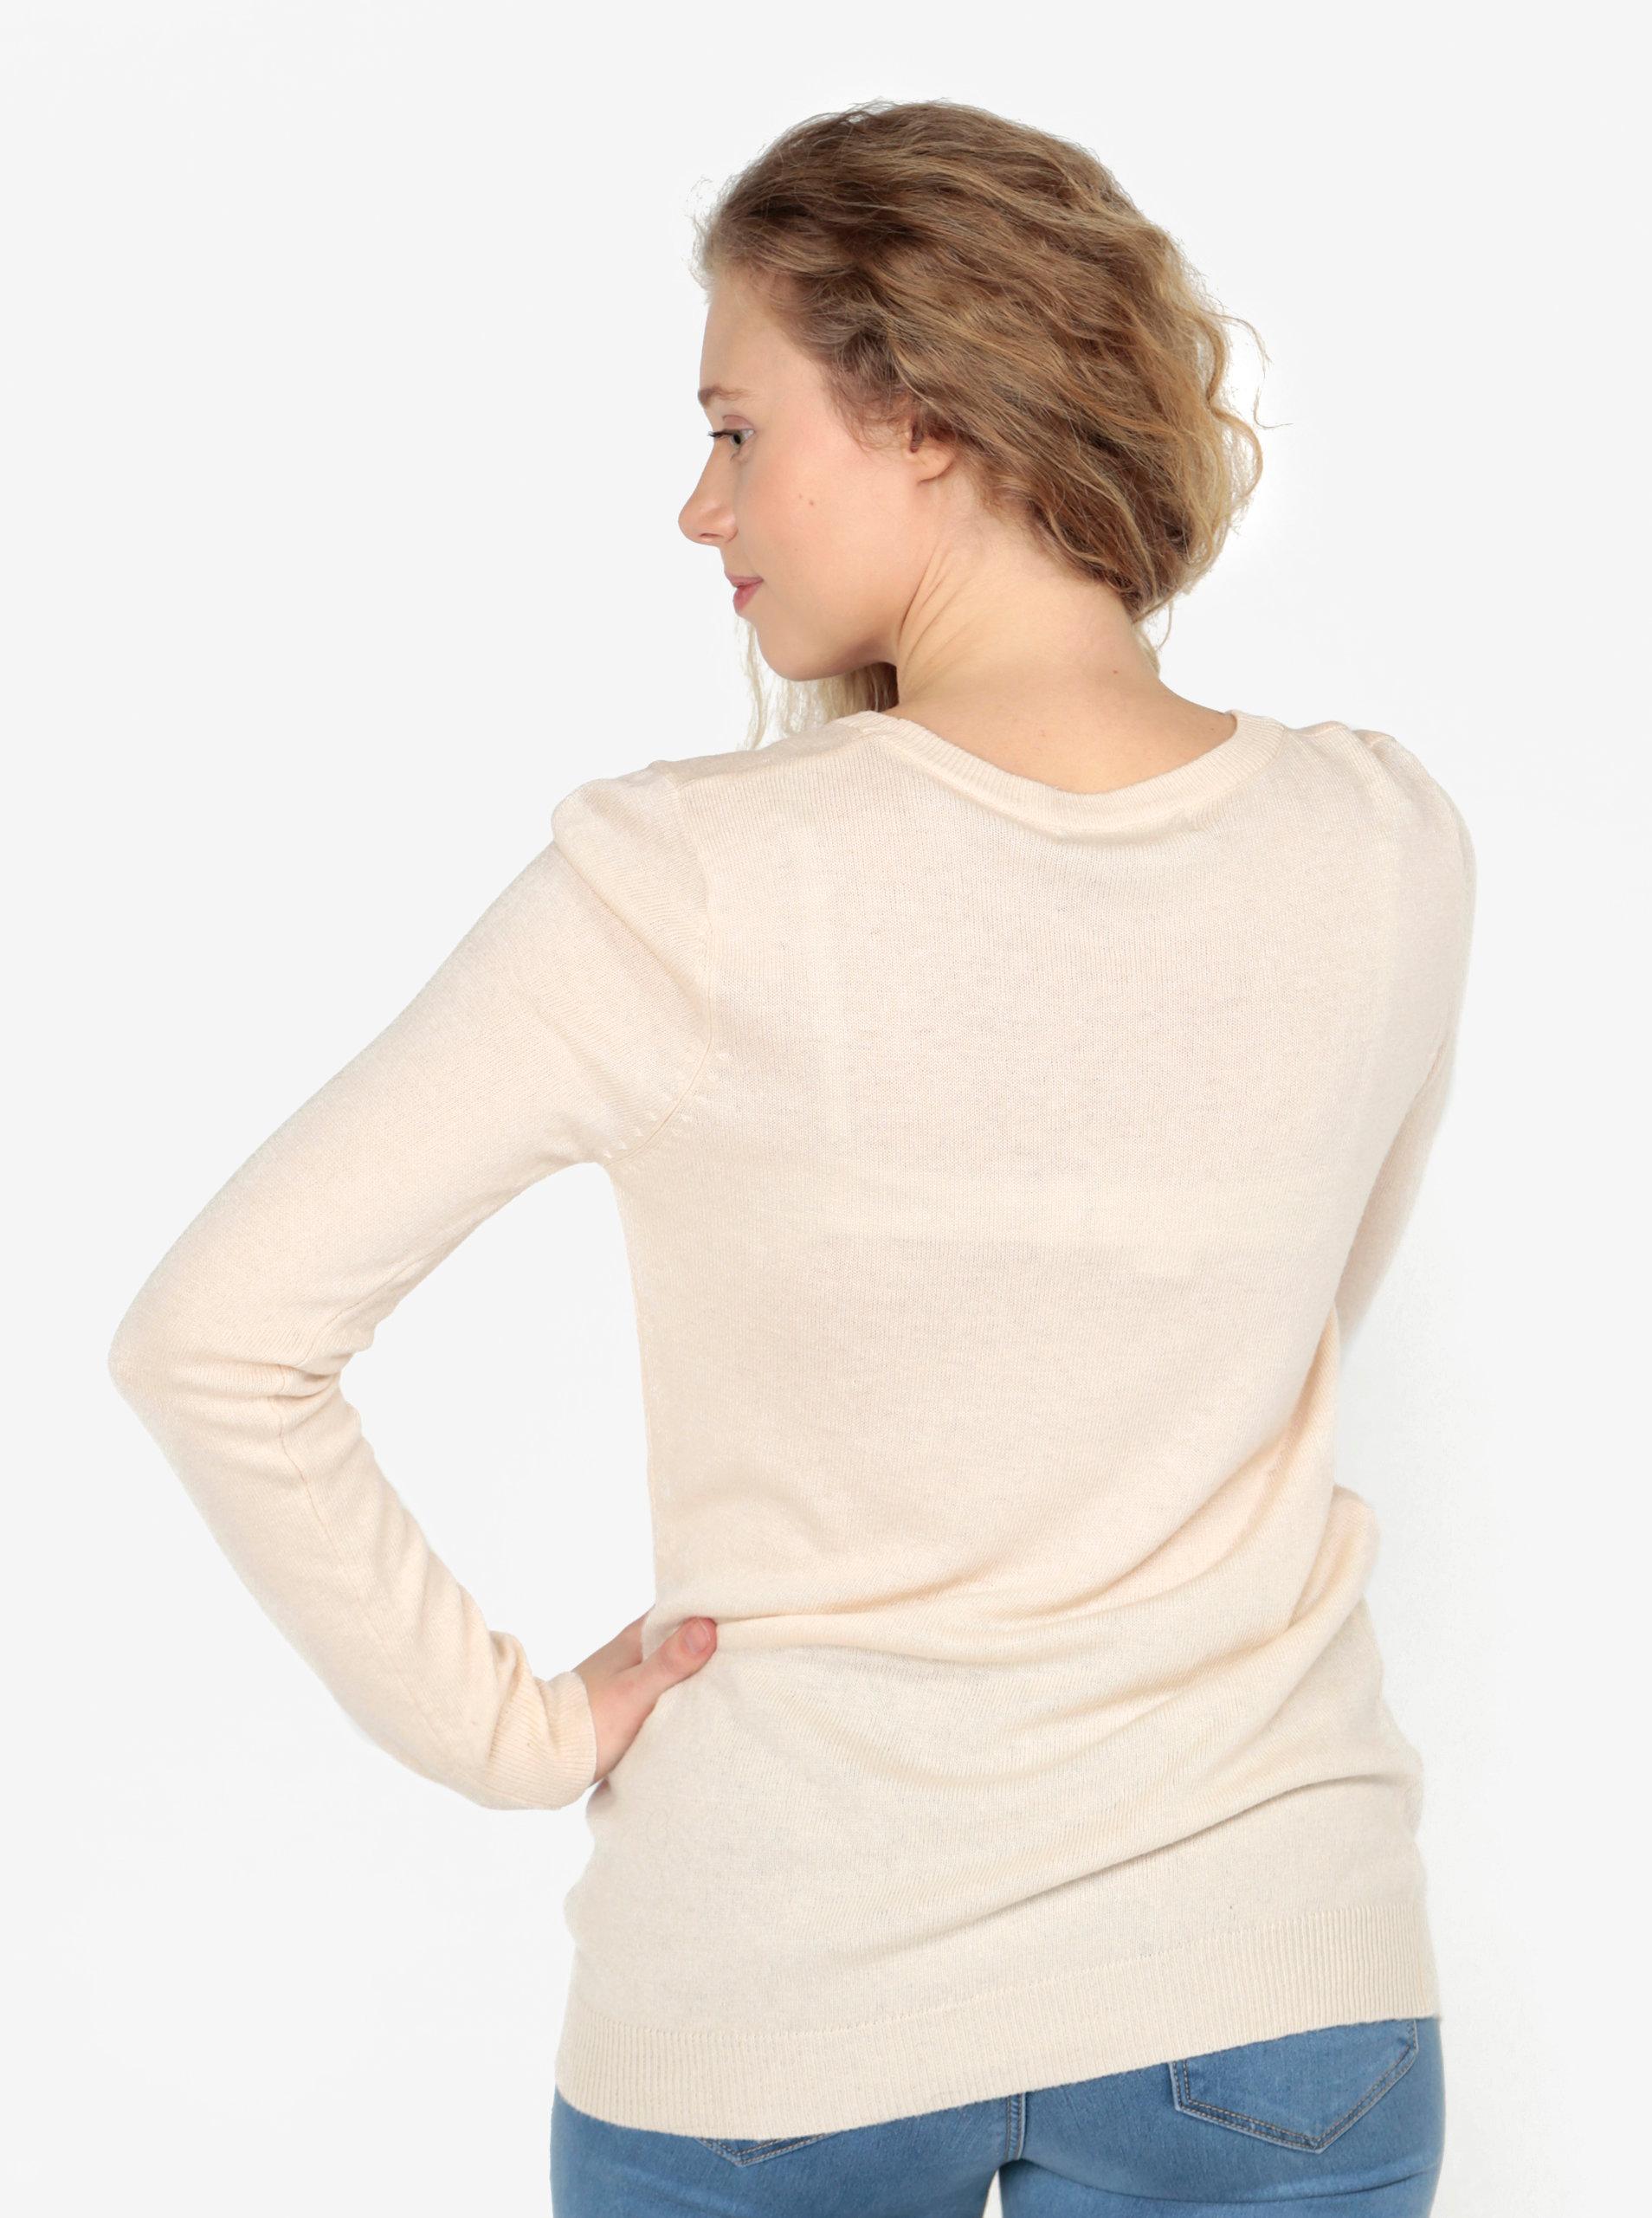 Béžový lehký svetr s motivem jelena z flitrů Oasis Xmas ... 5a6297f522